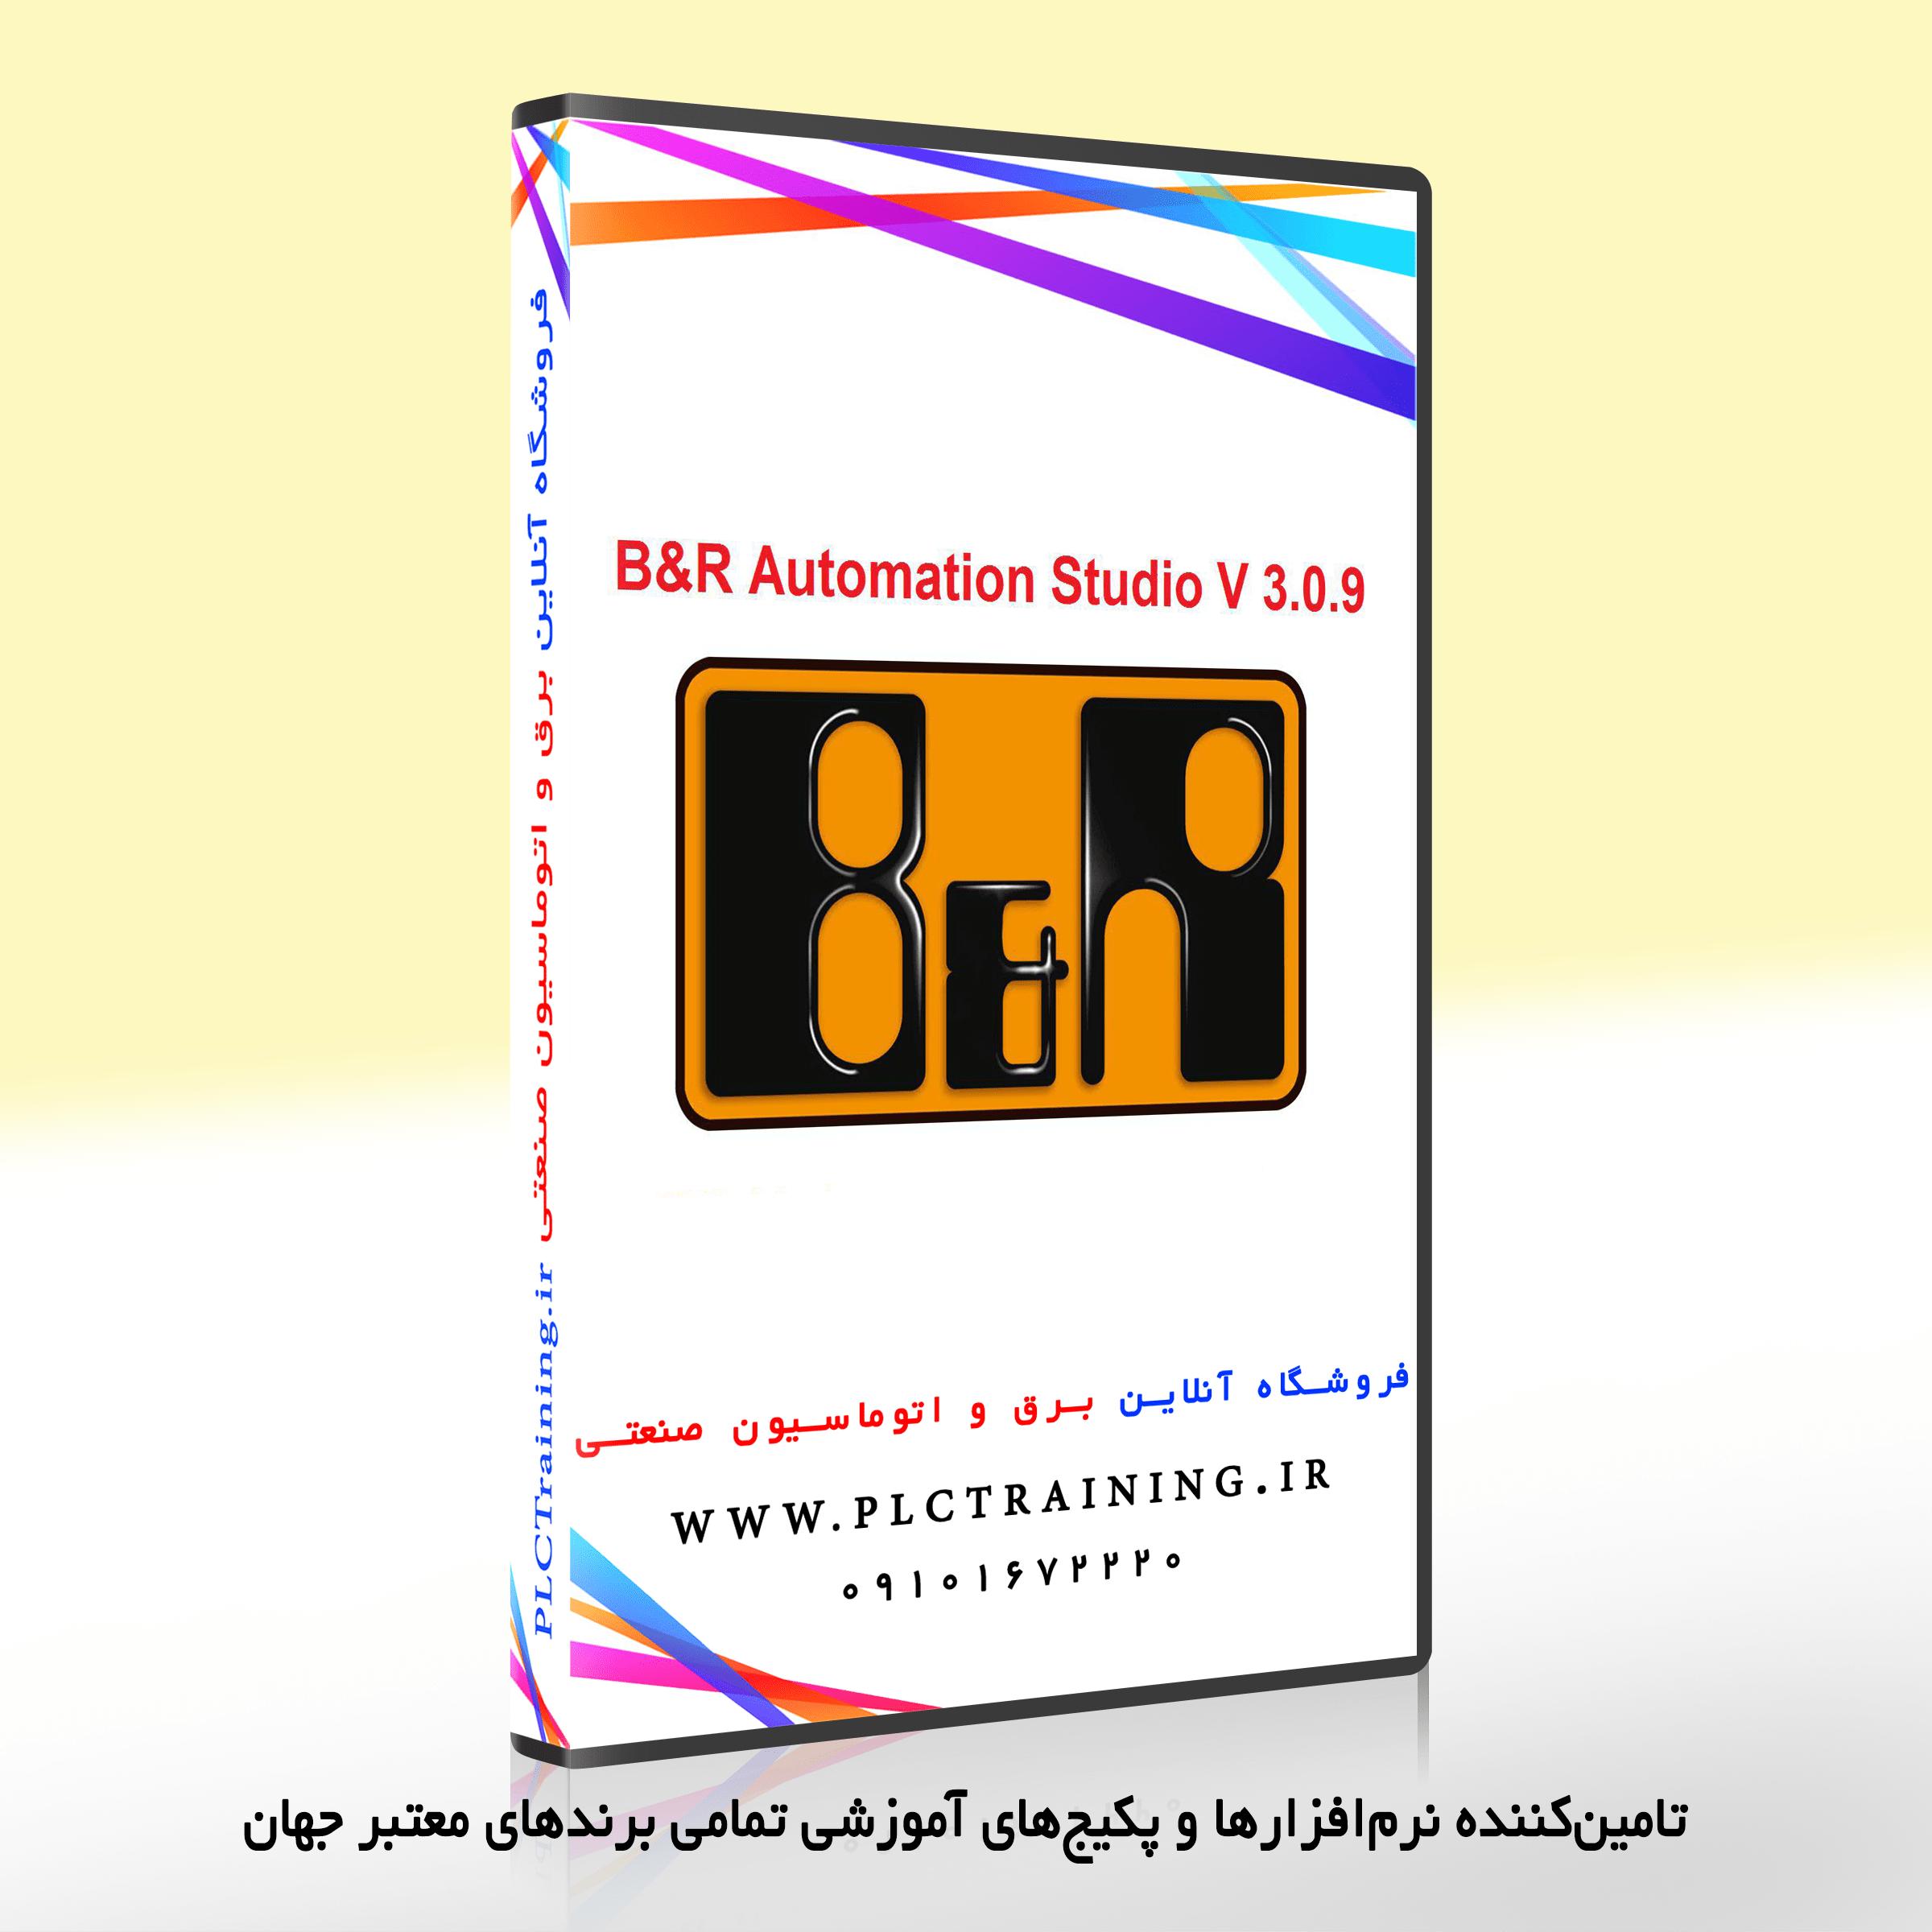 b&r automation studio download